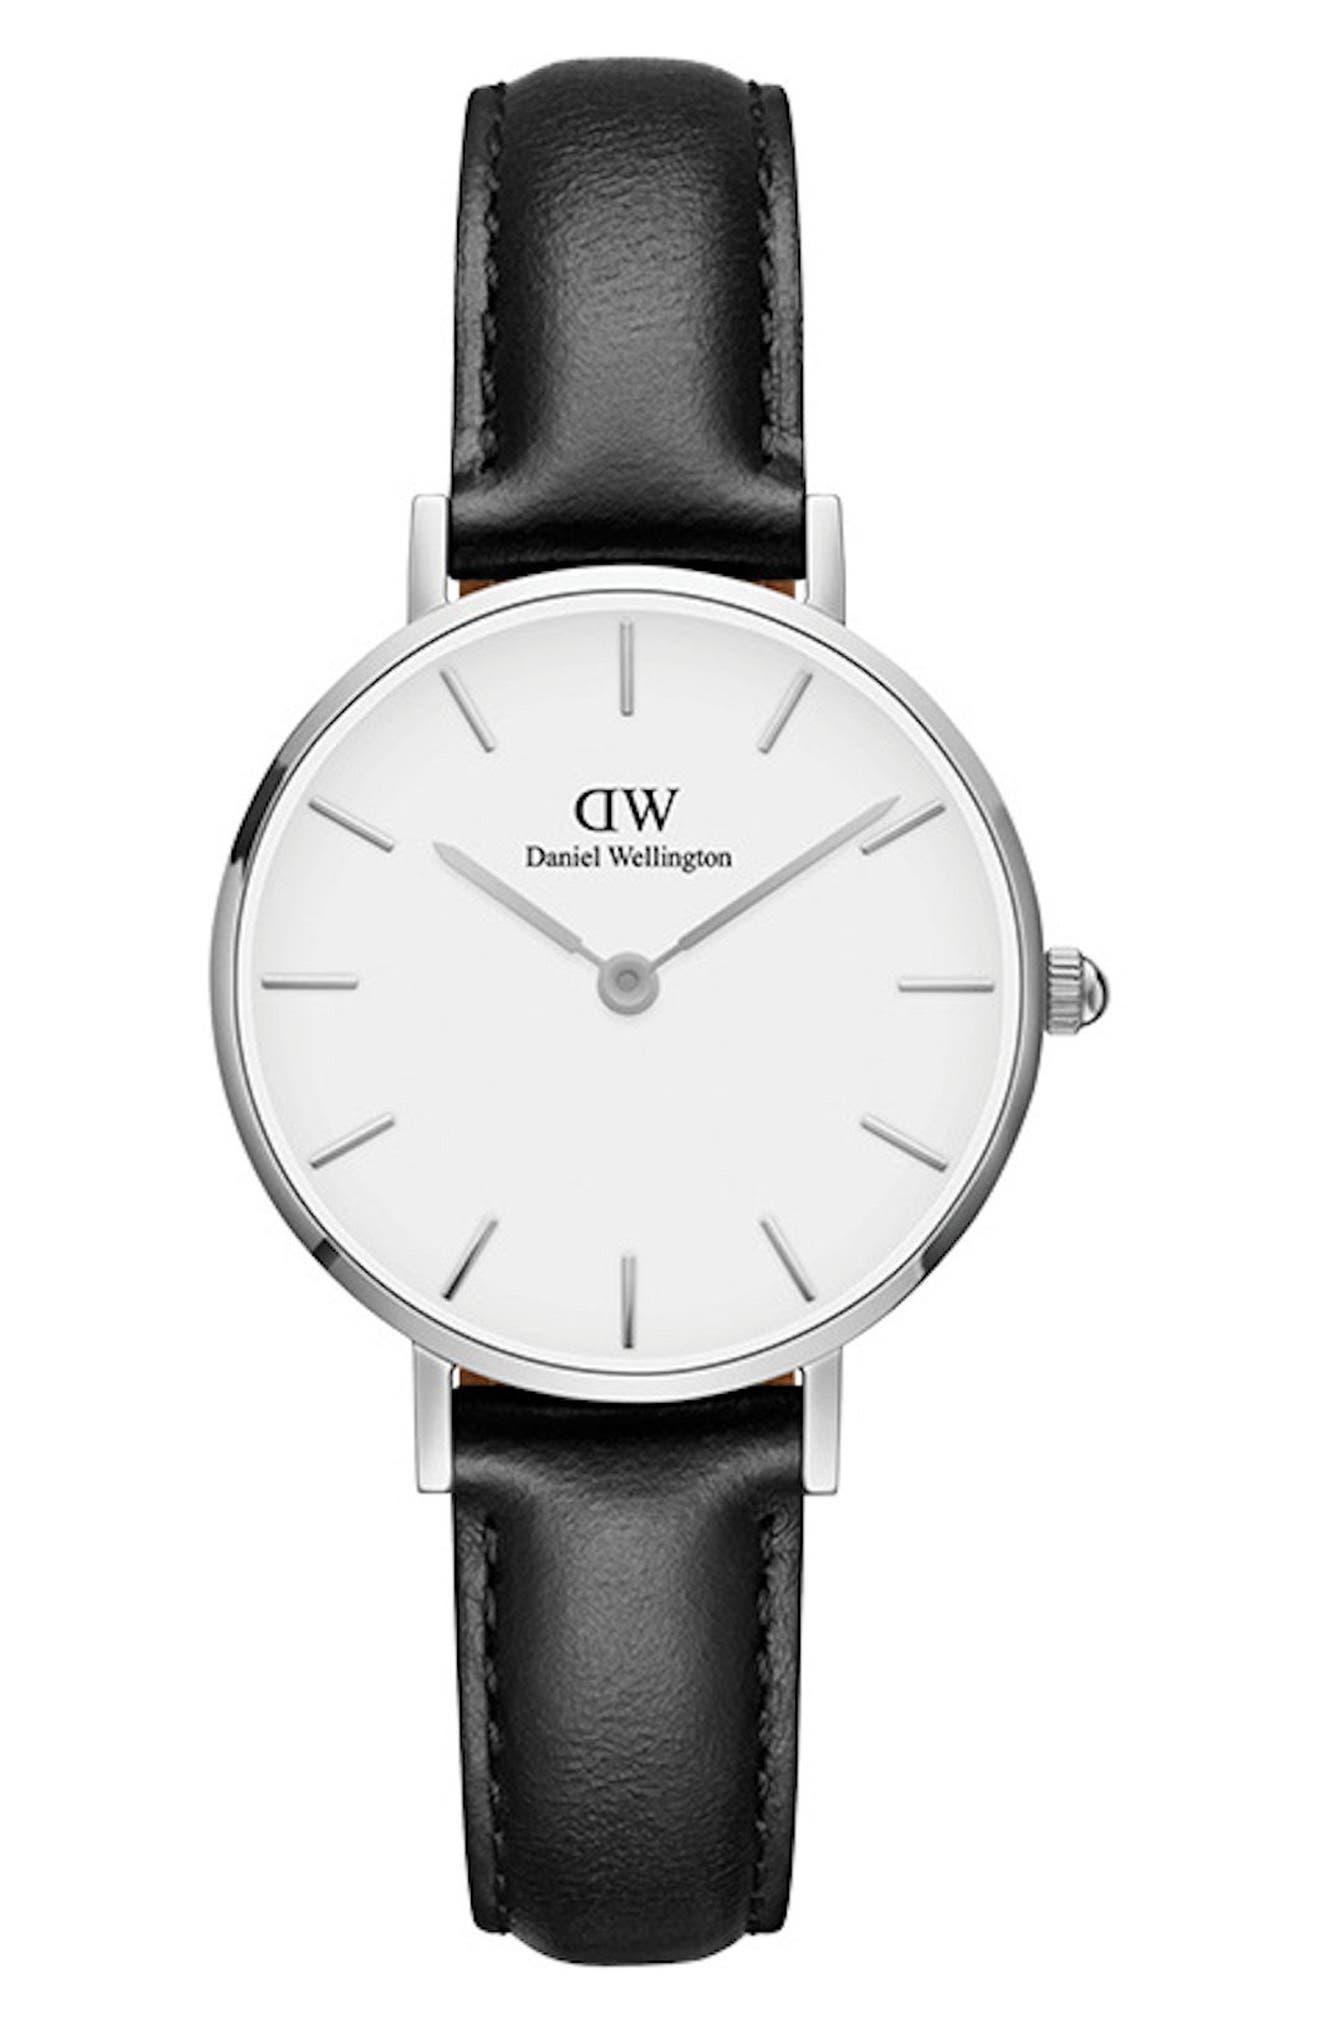 DANIEL WELLINGTON Classic Petite Leather Strap Watch, 28mm, Main, color, BLACK/ WHITE/ SILVER